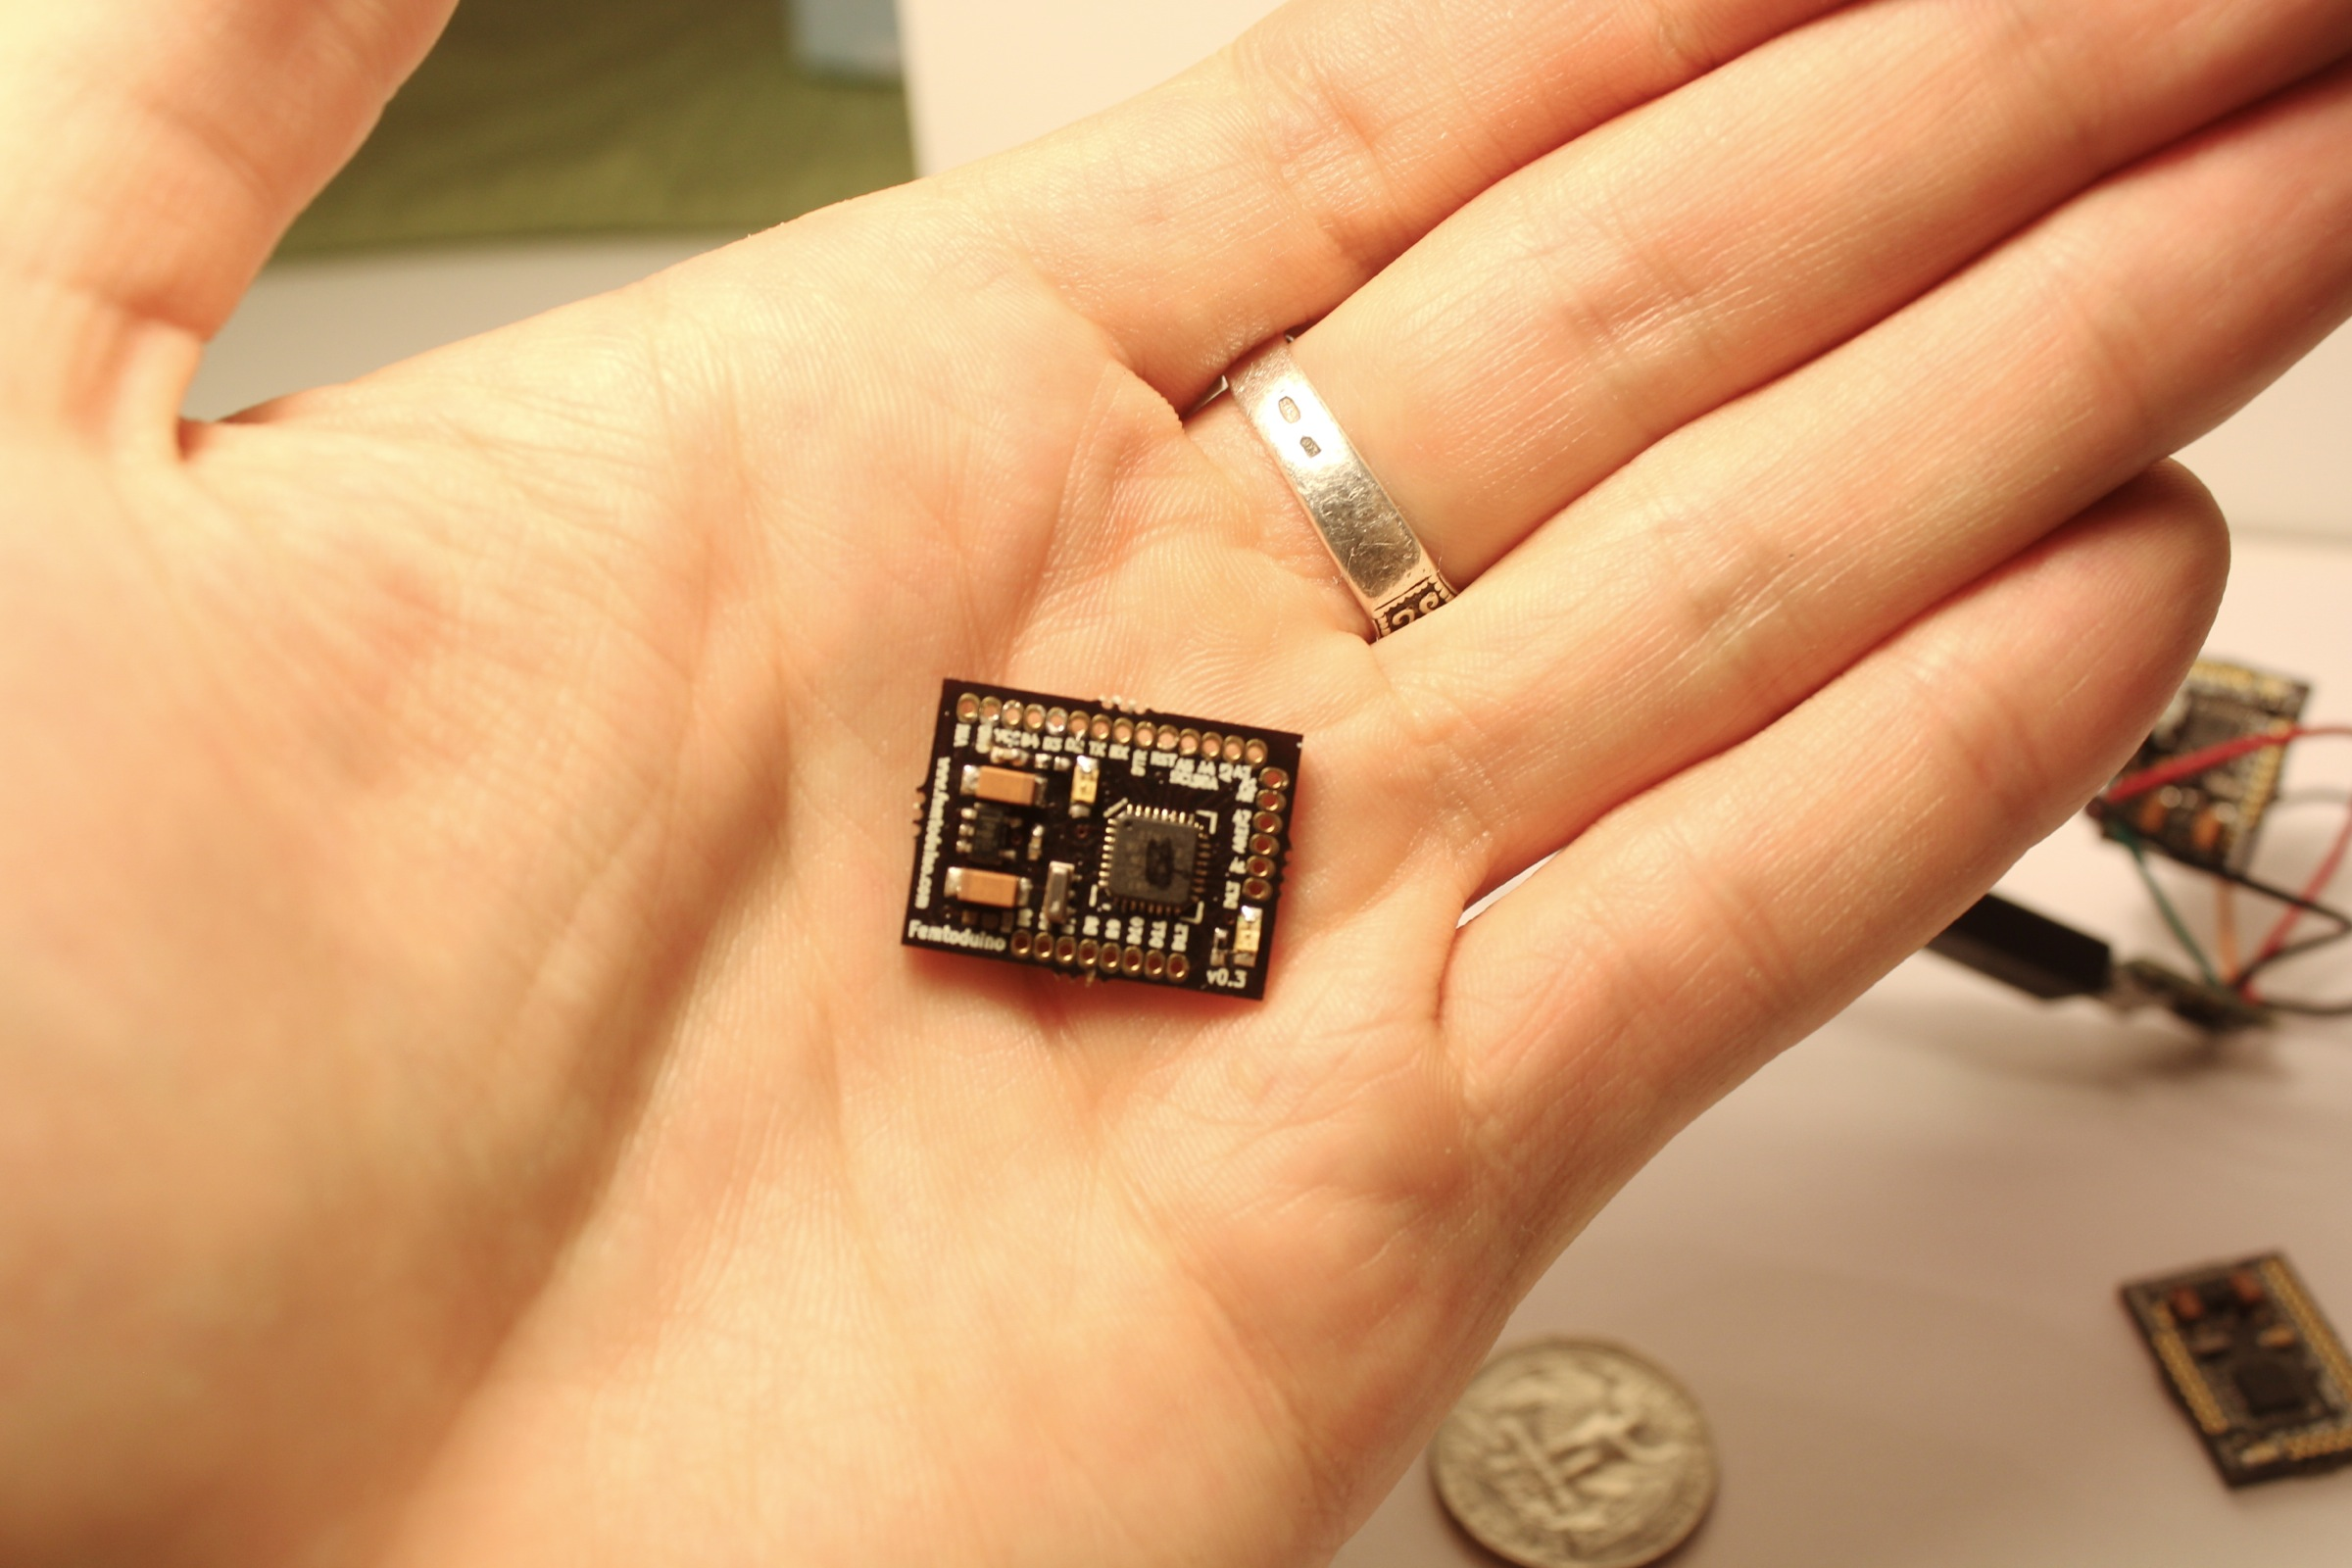 Femtoduino Arduino